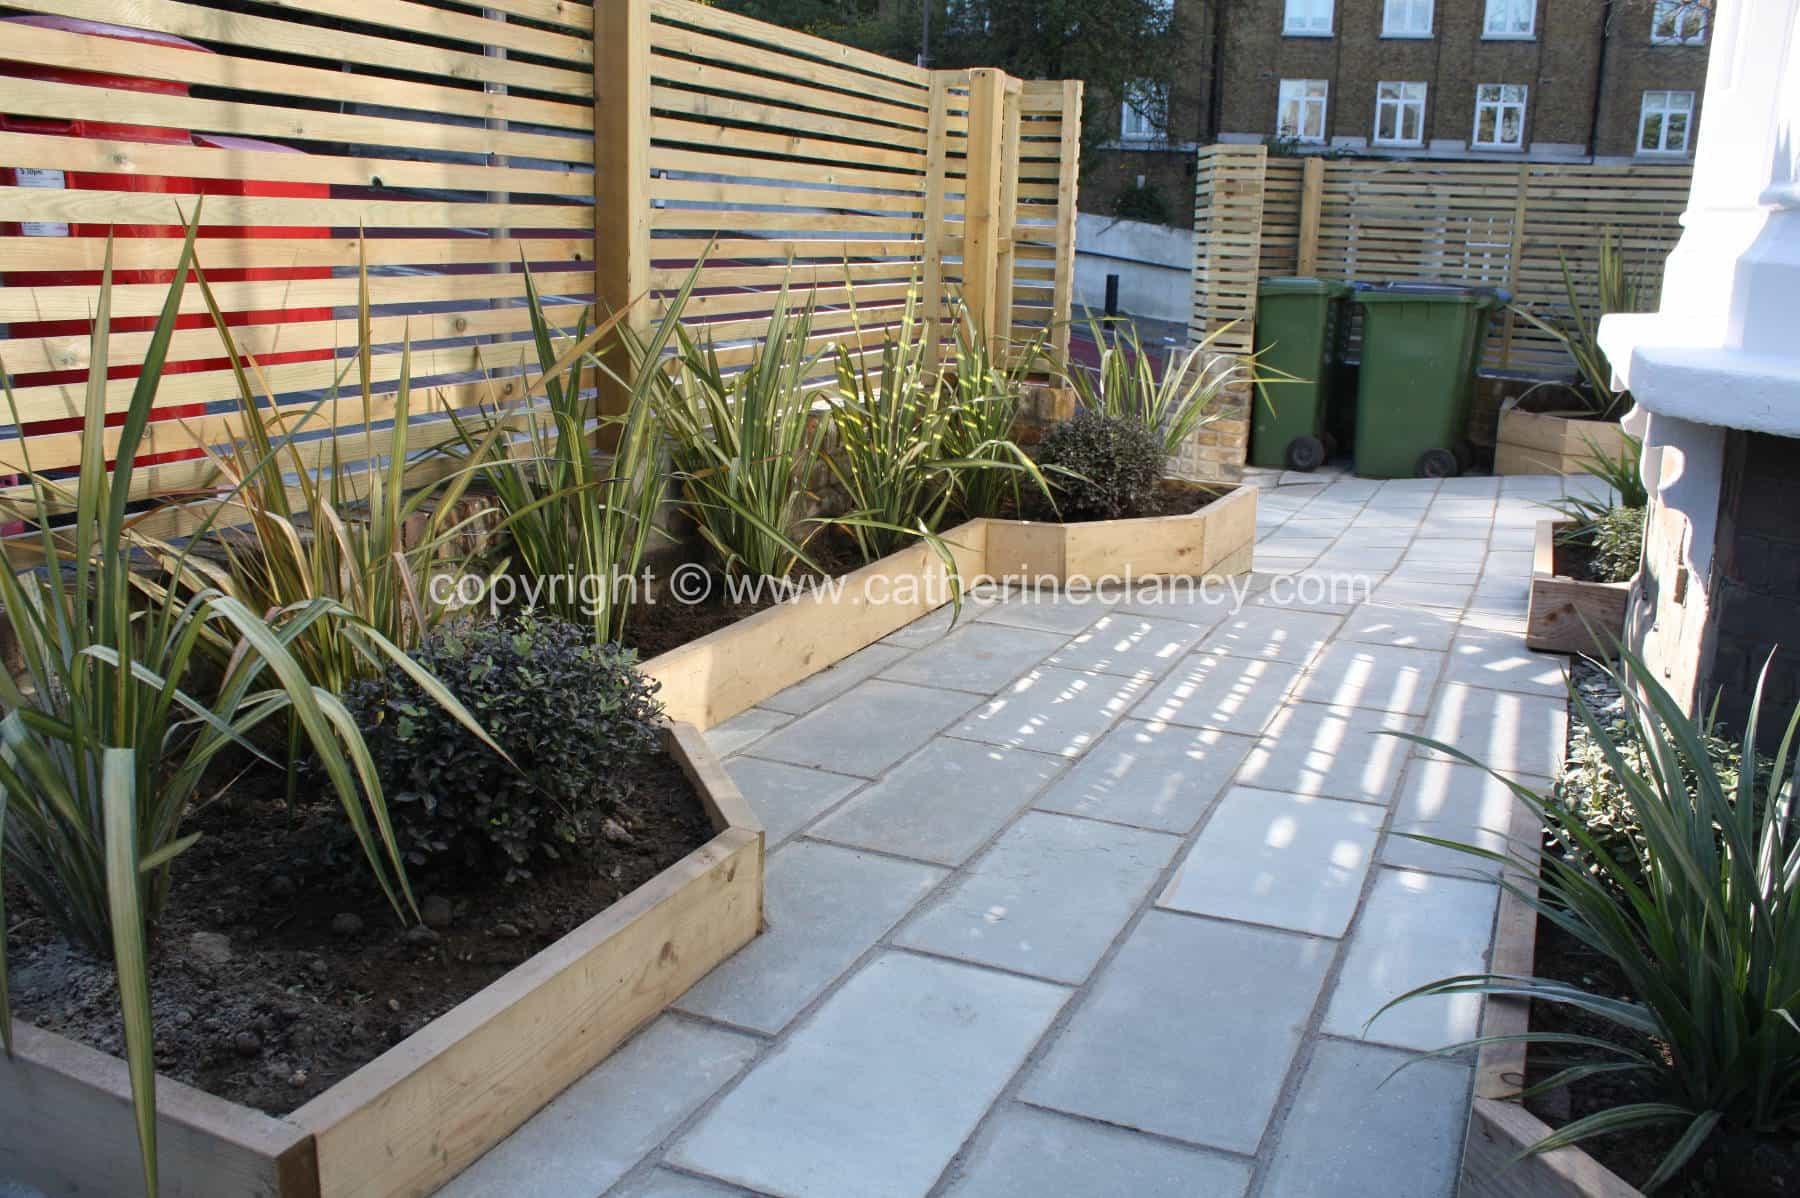 Urban front garden garden design london catherine clancy for Garden design ideas london